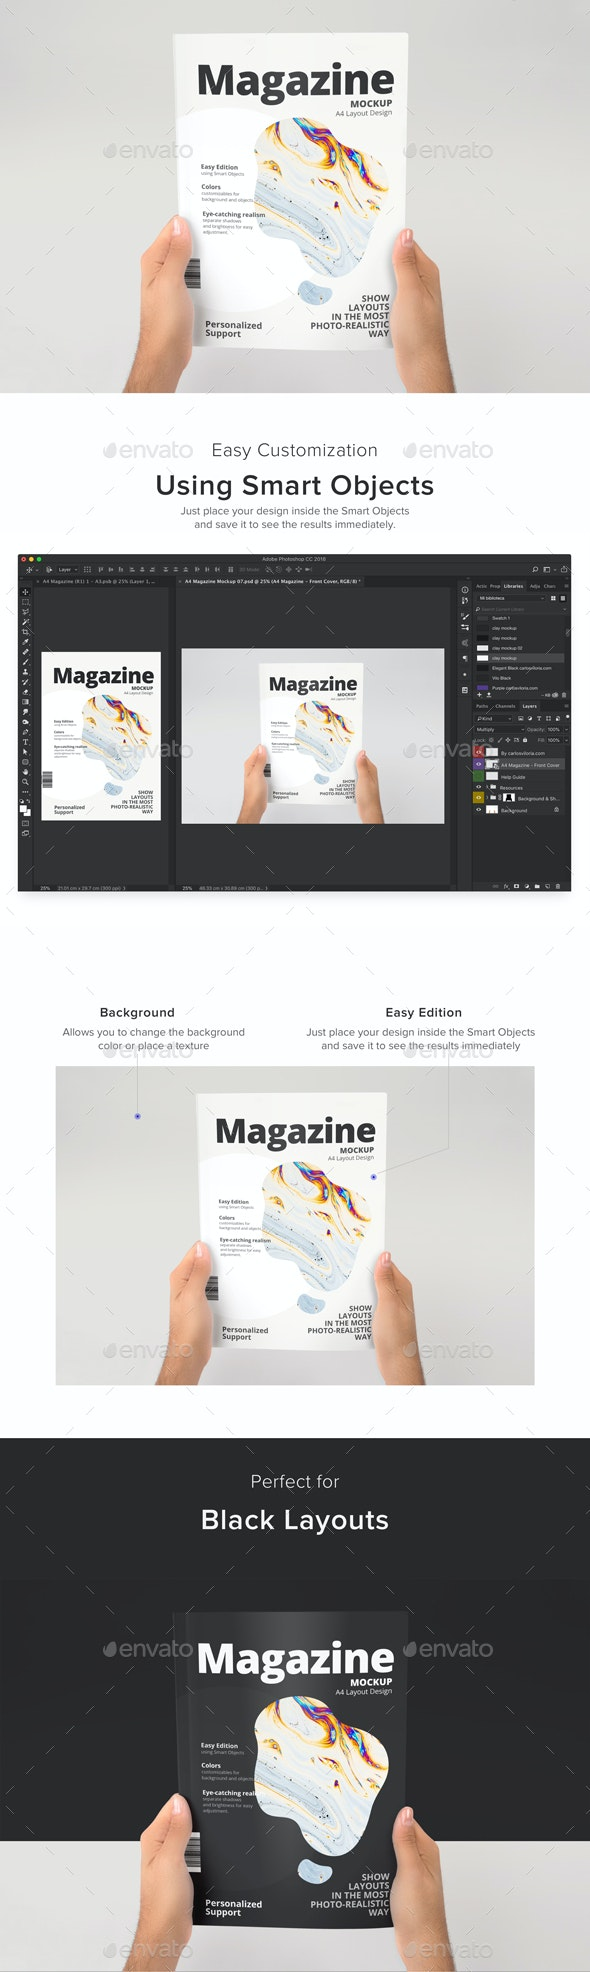 A4 Magazine Mockup 07 - Magazines Print